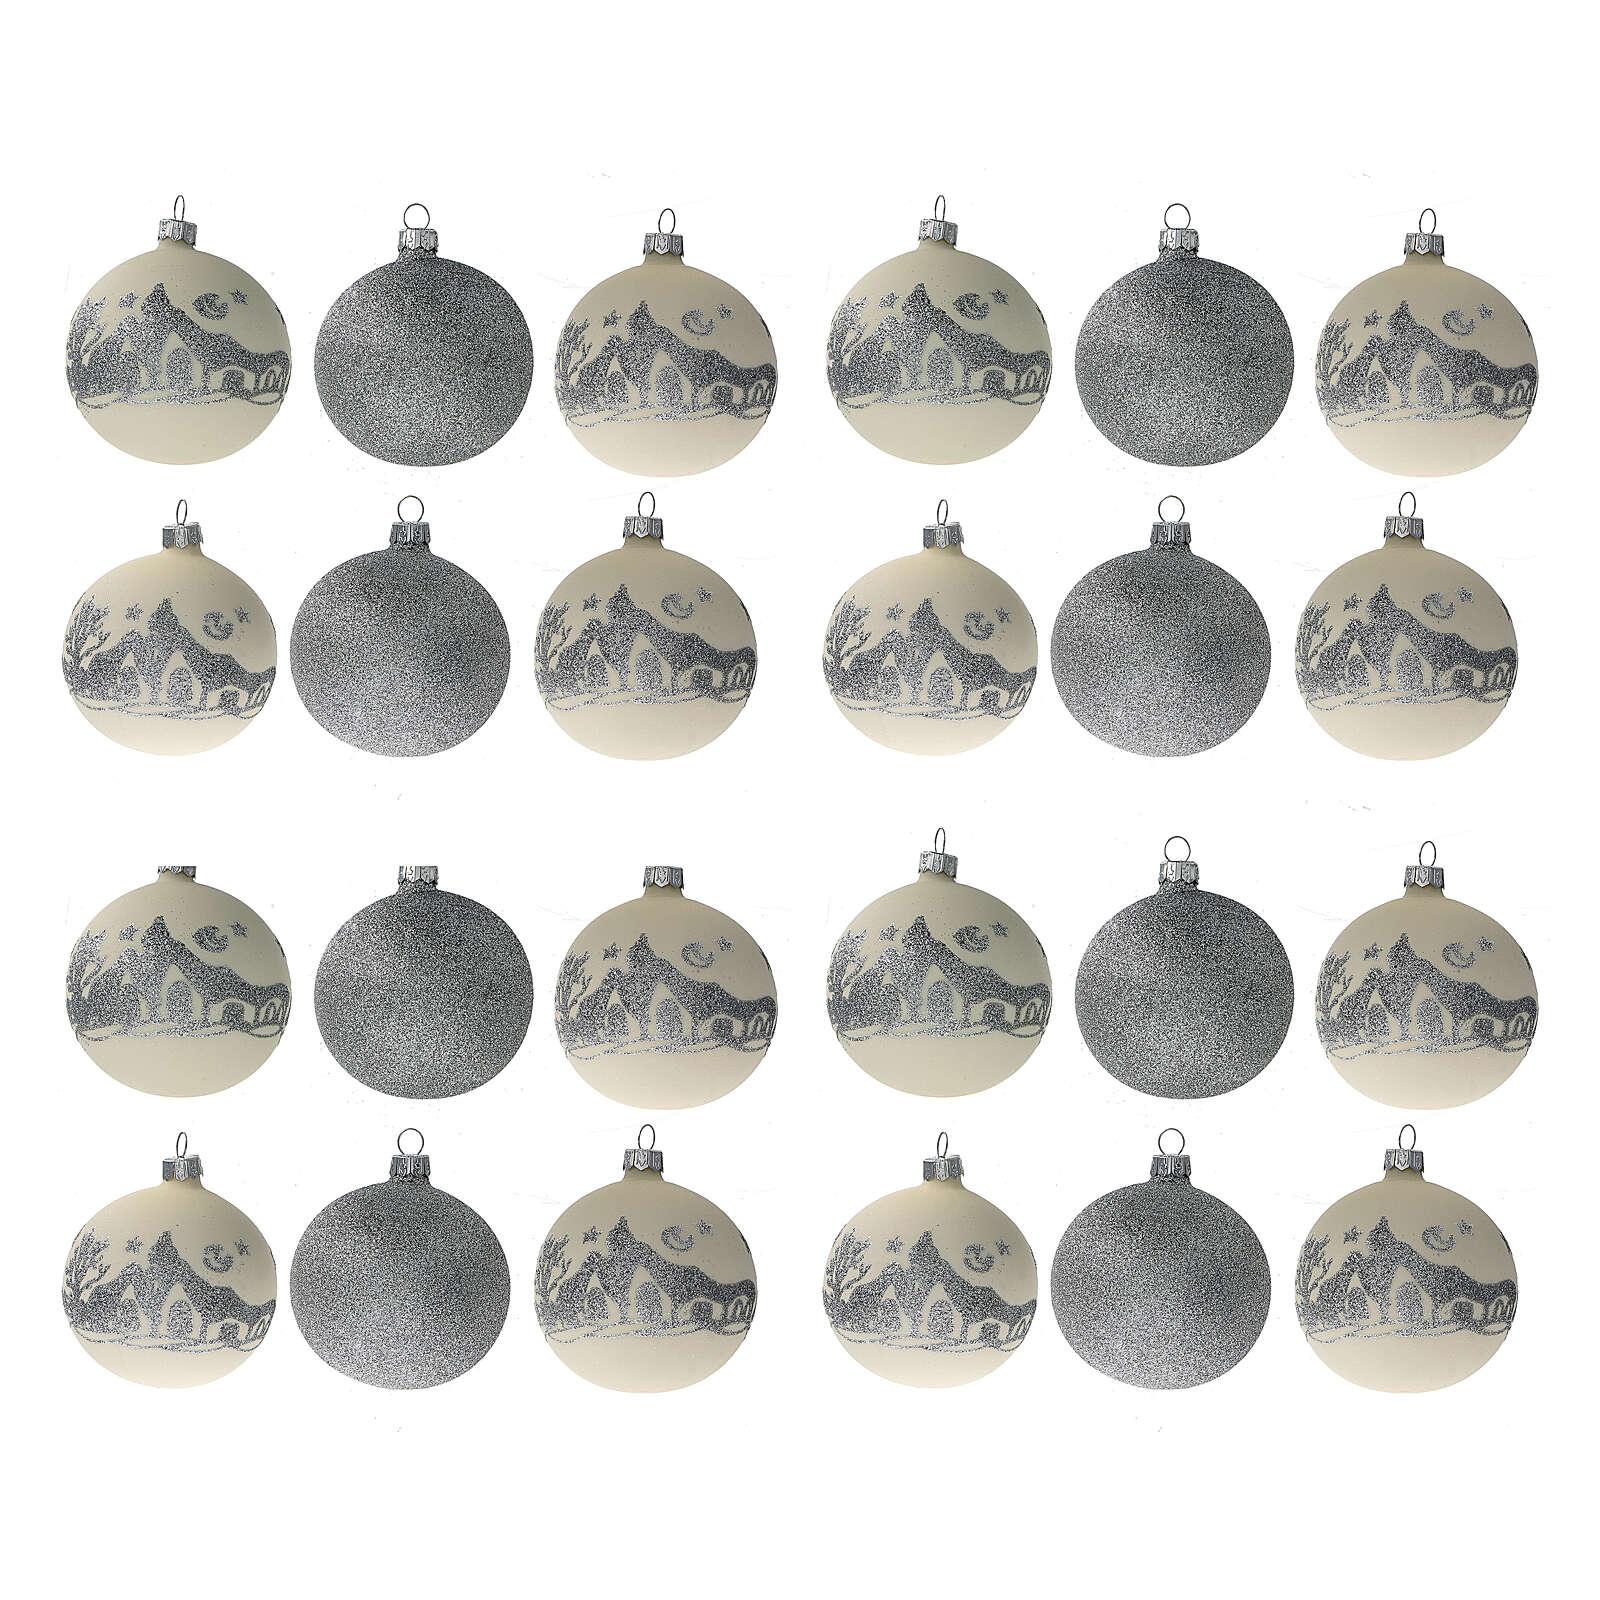 Glass Christmas ornaments silver glitter 24 pcs 80 mm 4